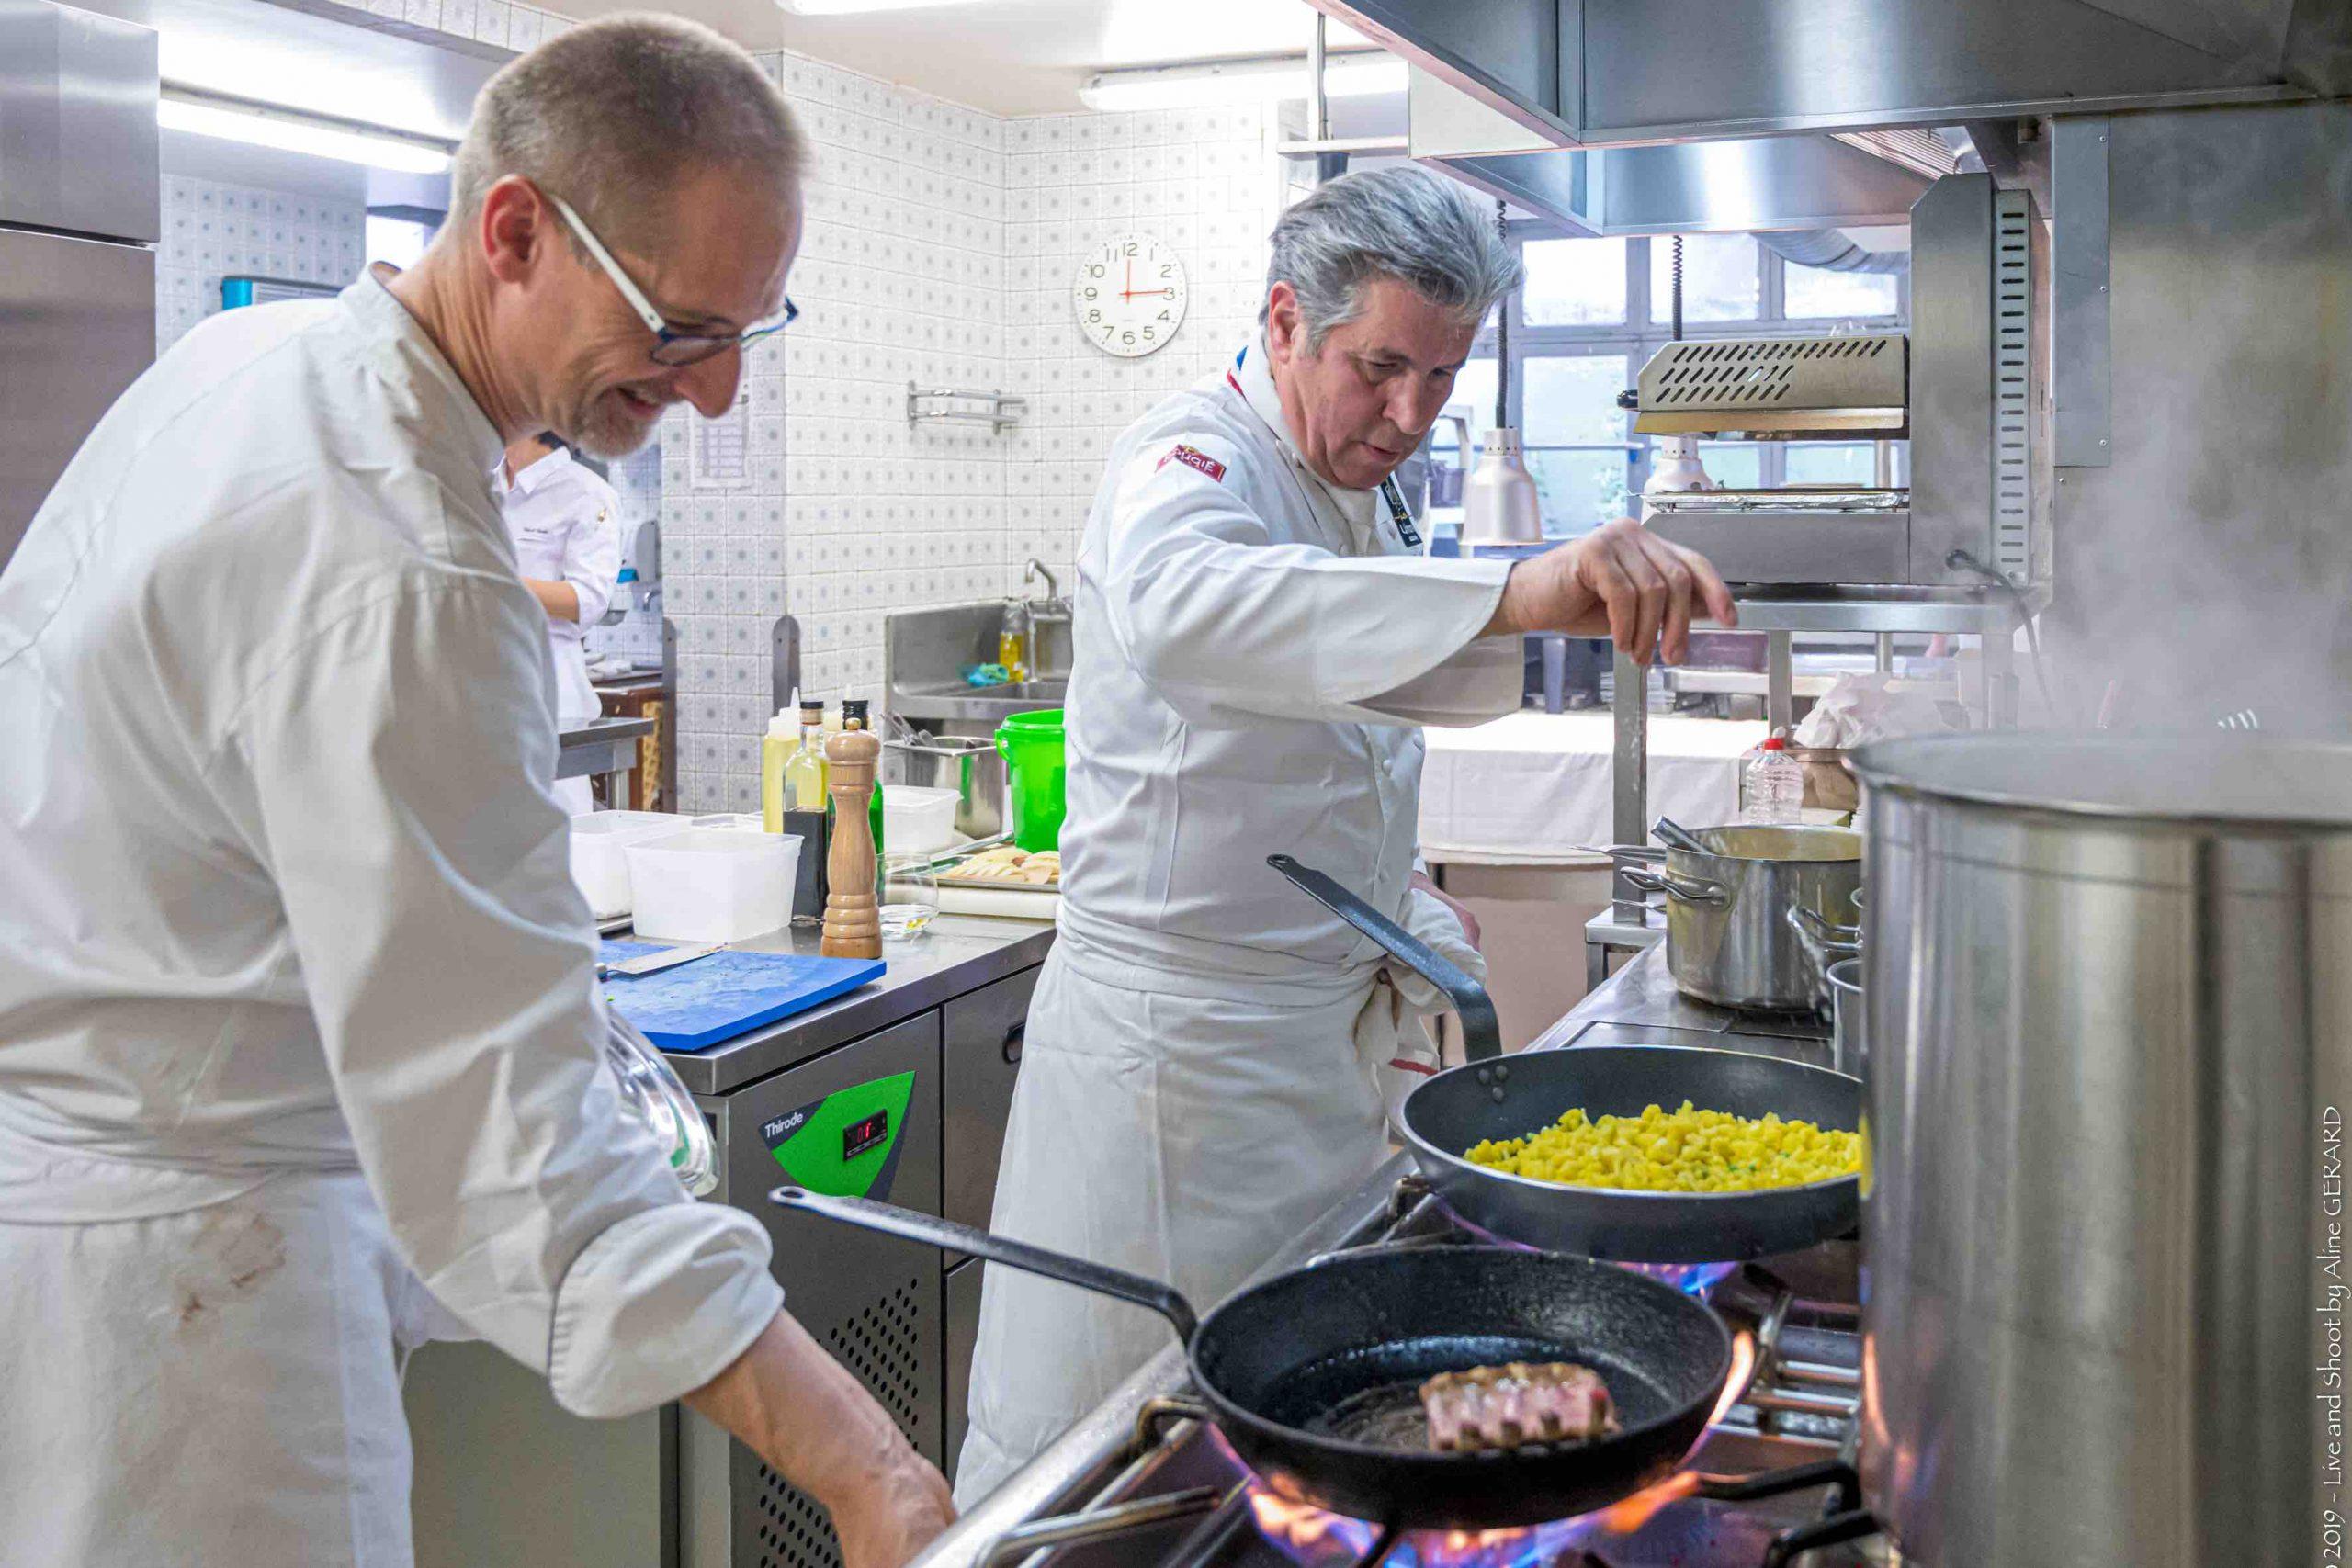 JUlien Binz et Michel Roth dans la cuisine du restaurant Julien Binz à Ammerschwihr